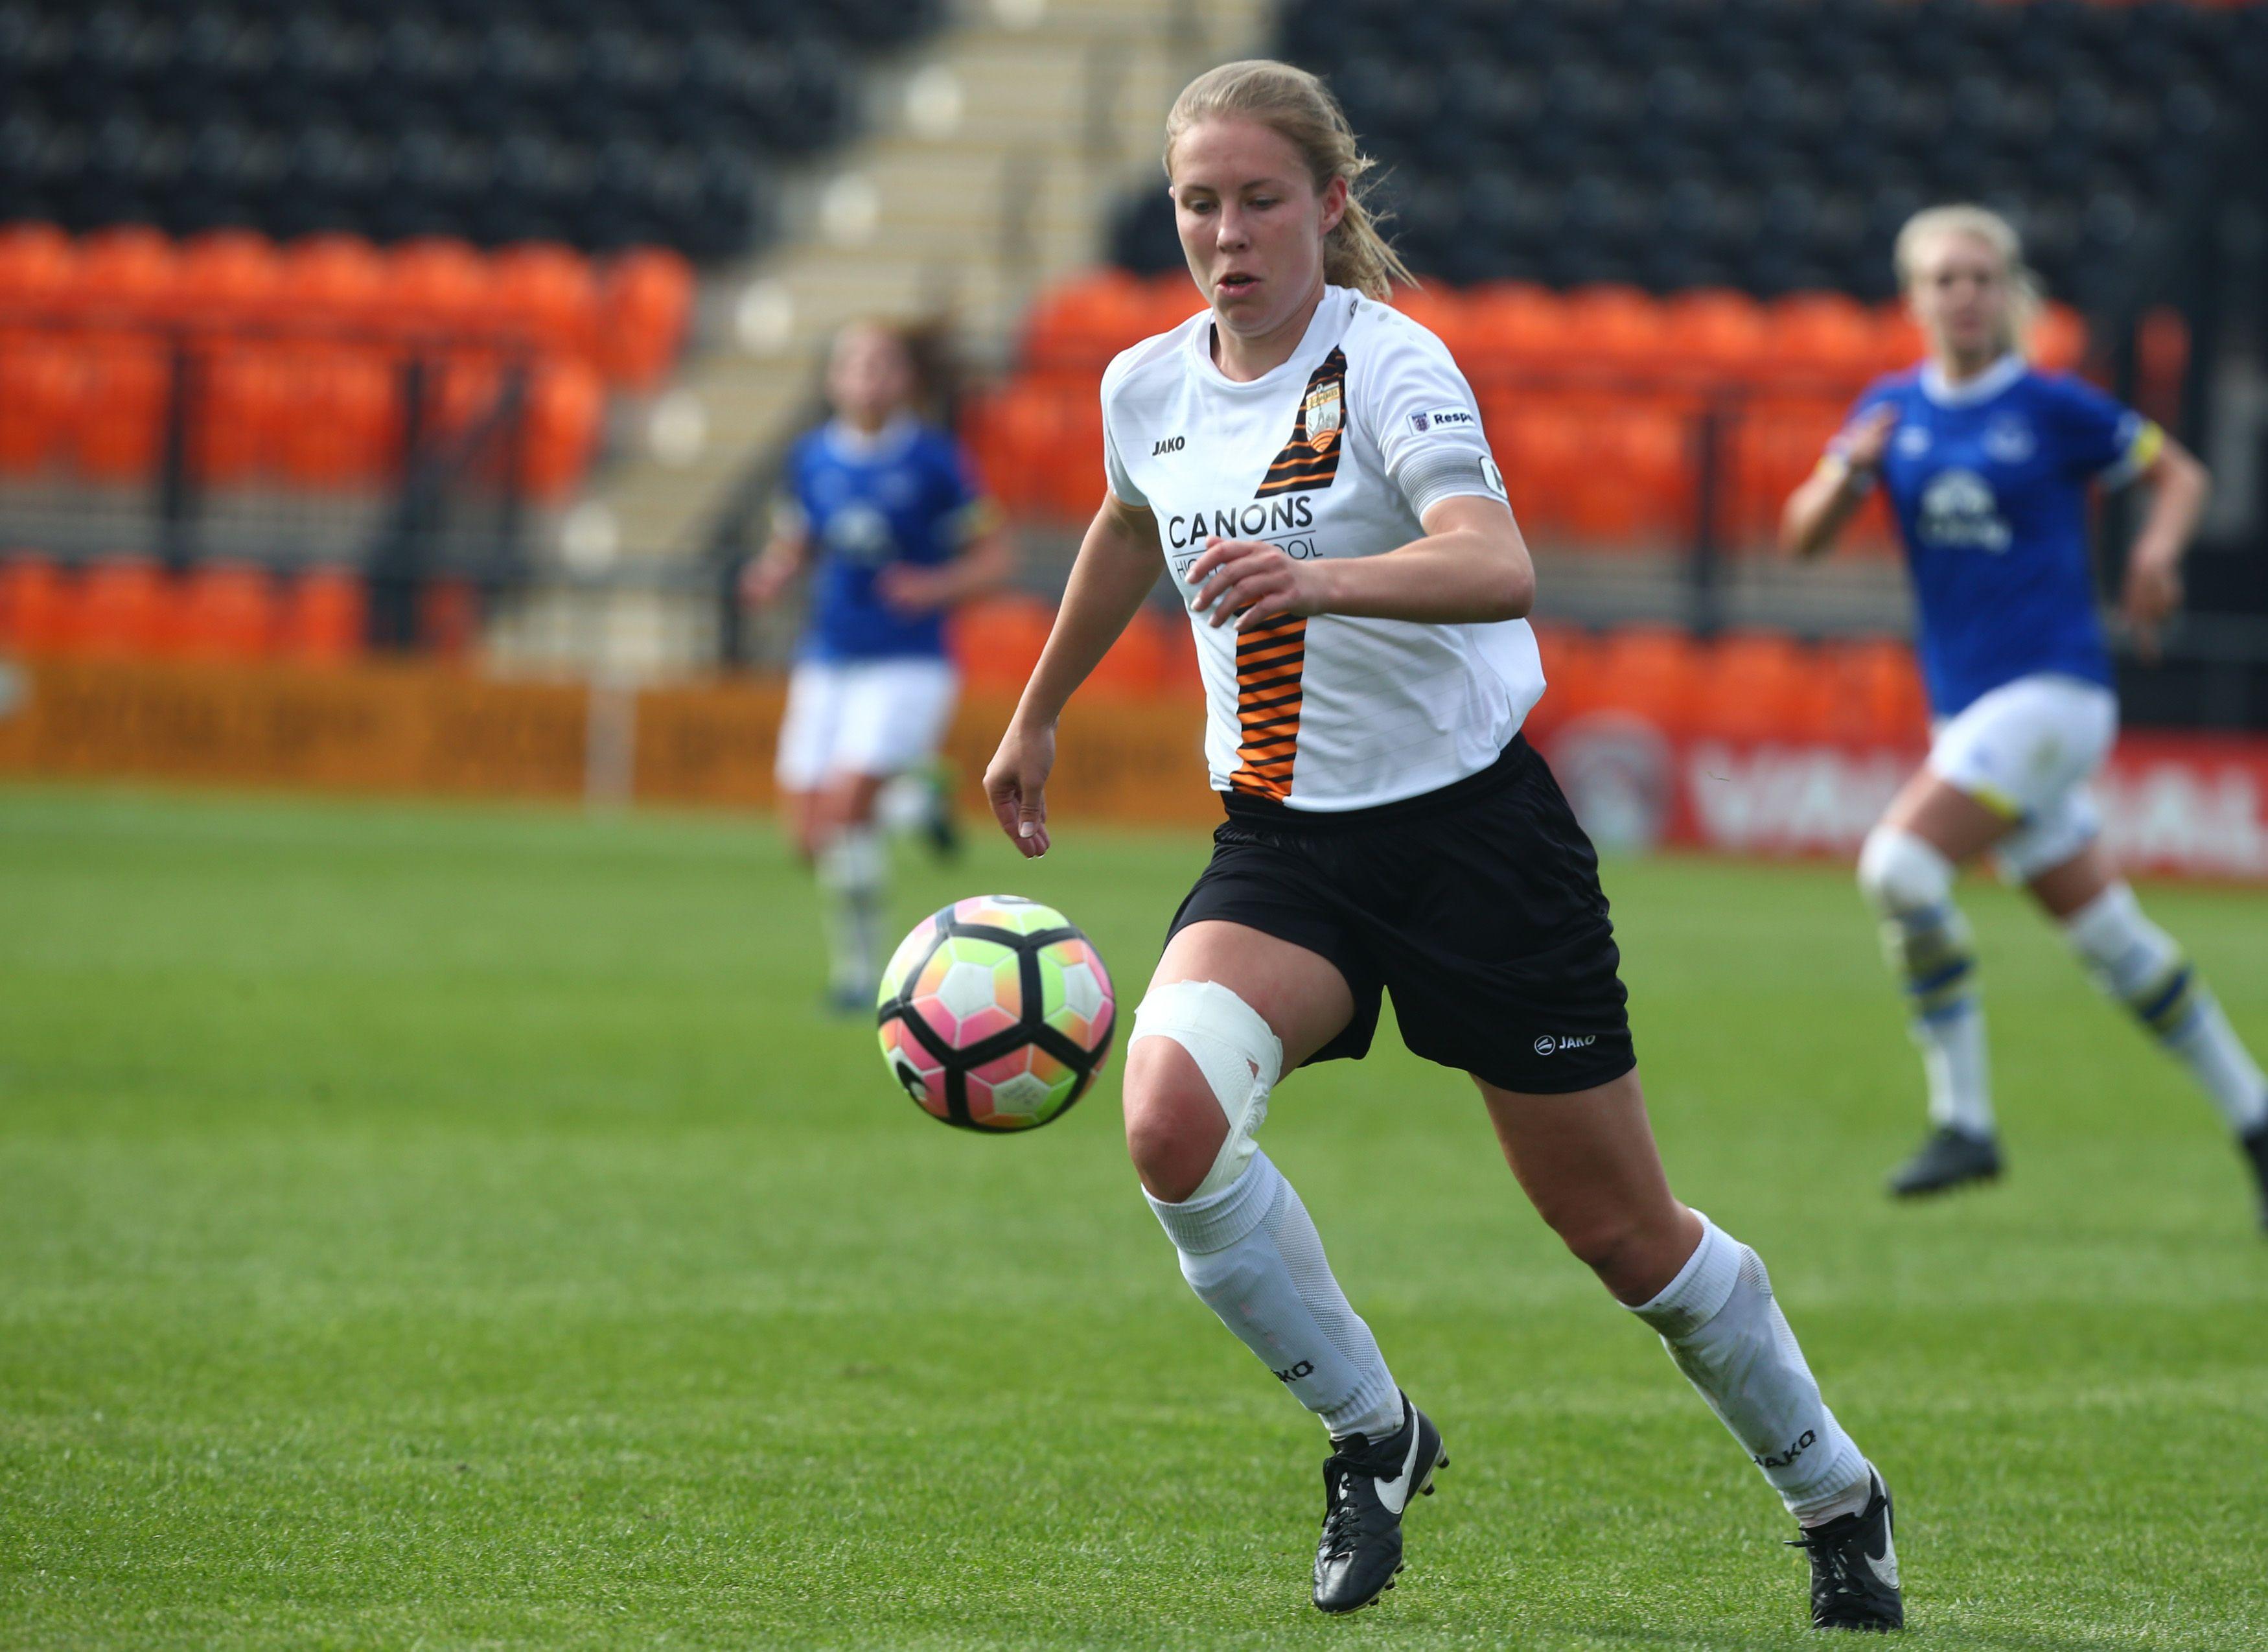 Footballer Ashleigh Goddard: I Was Body-Shamed After Winning Wayne Rooney's Street Striker